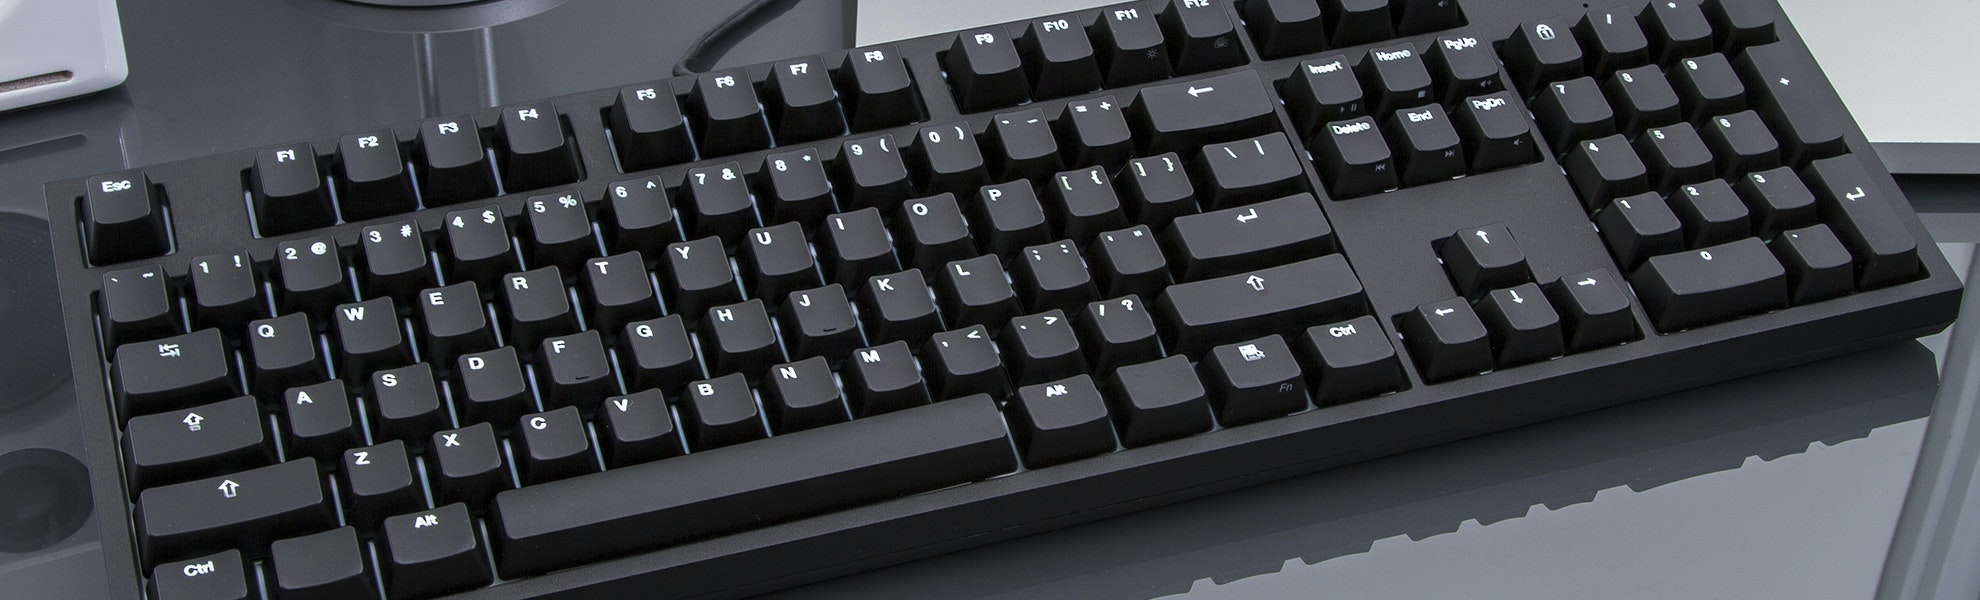 Code Keyboard Fullsize